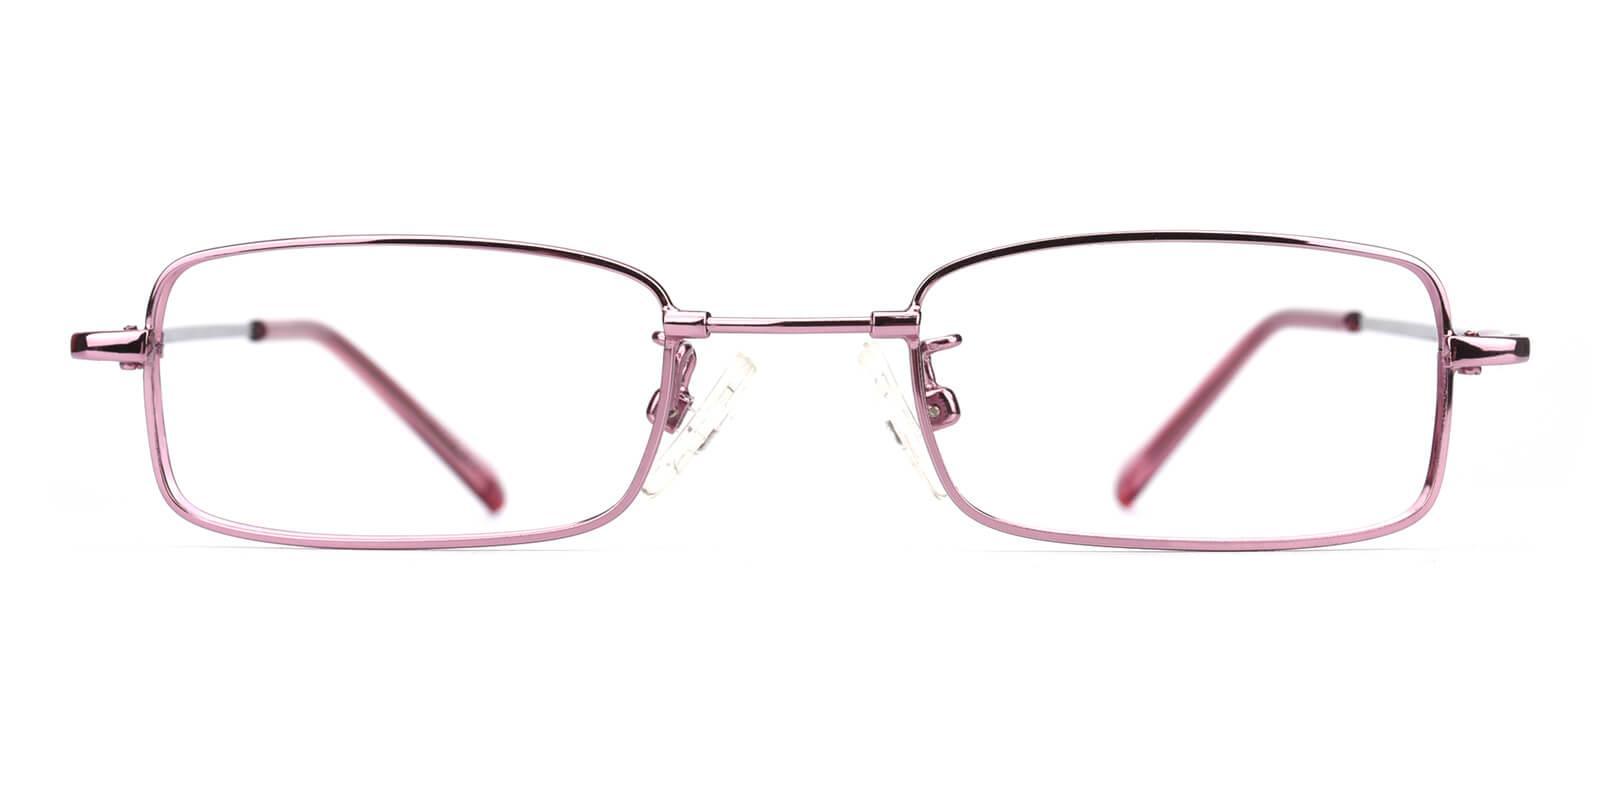 Lanscripe-Purple-Rectangle-Titanium-Eyeglasses-detail